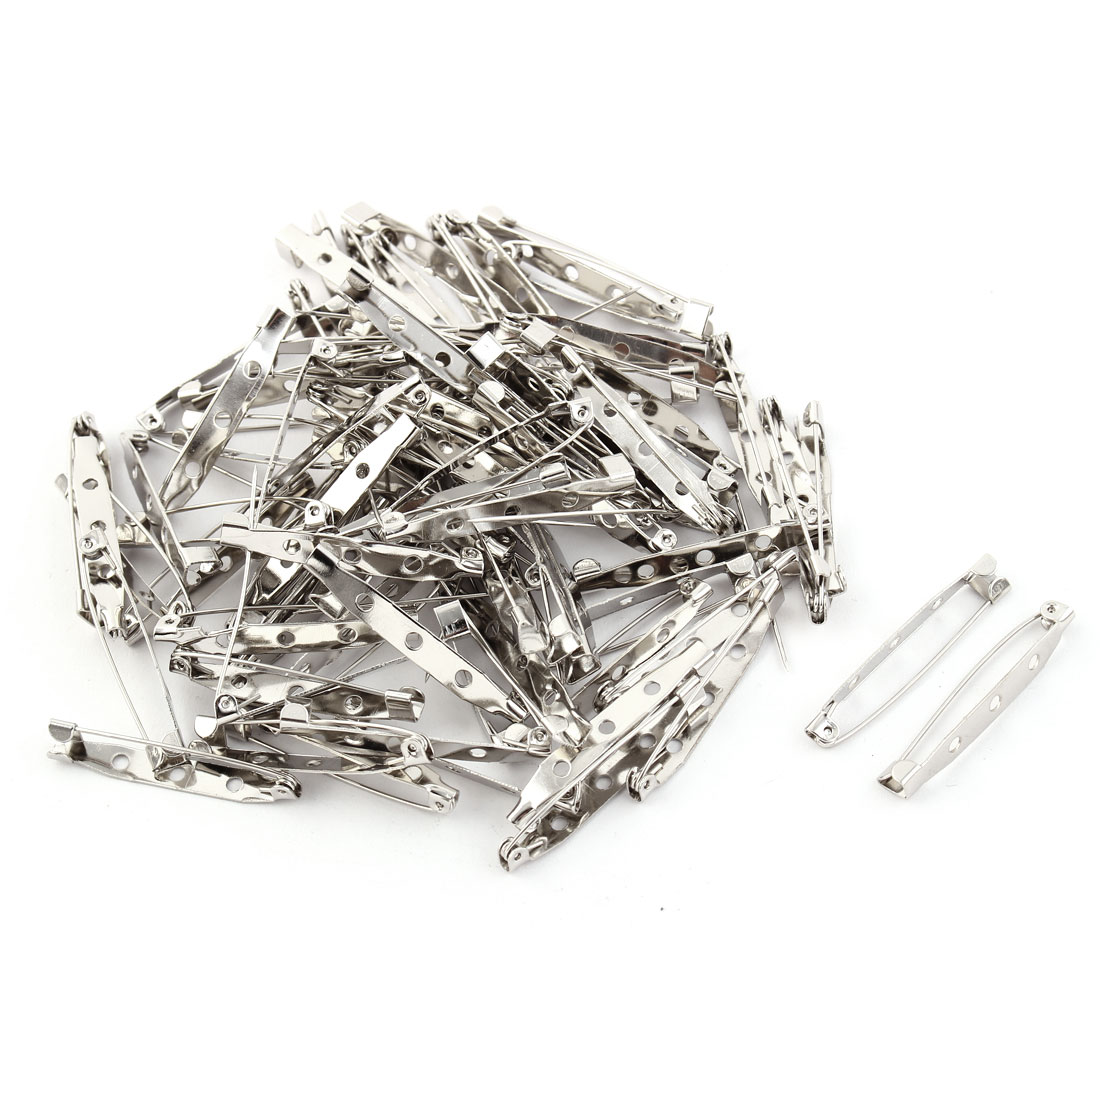 Metal Safety Pin Back Brooch Finding DIY Base Silver Tone 4cm Length 80pcs